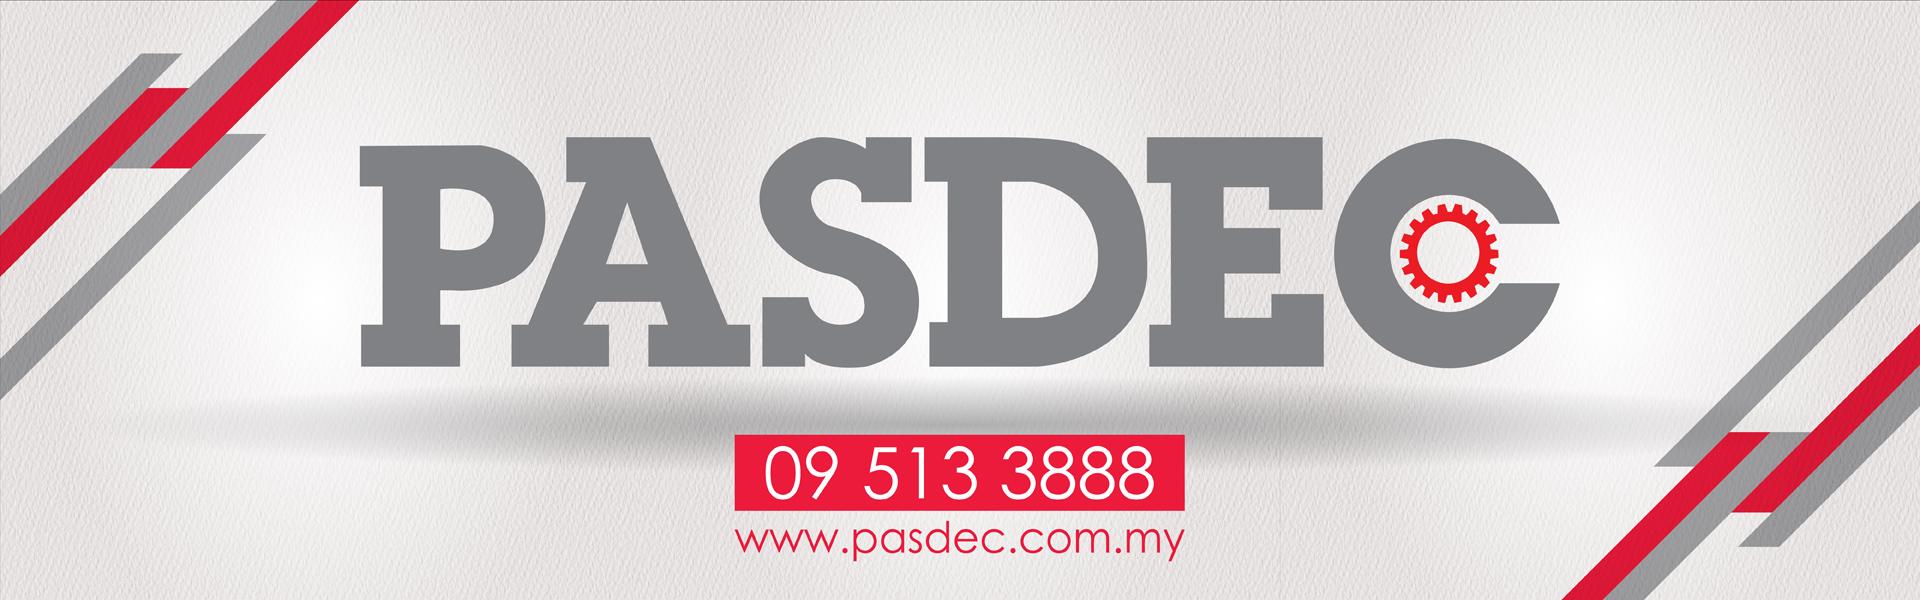 pasdec-property-slider-1